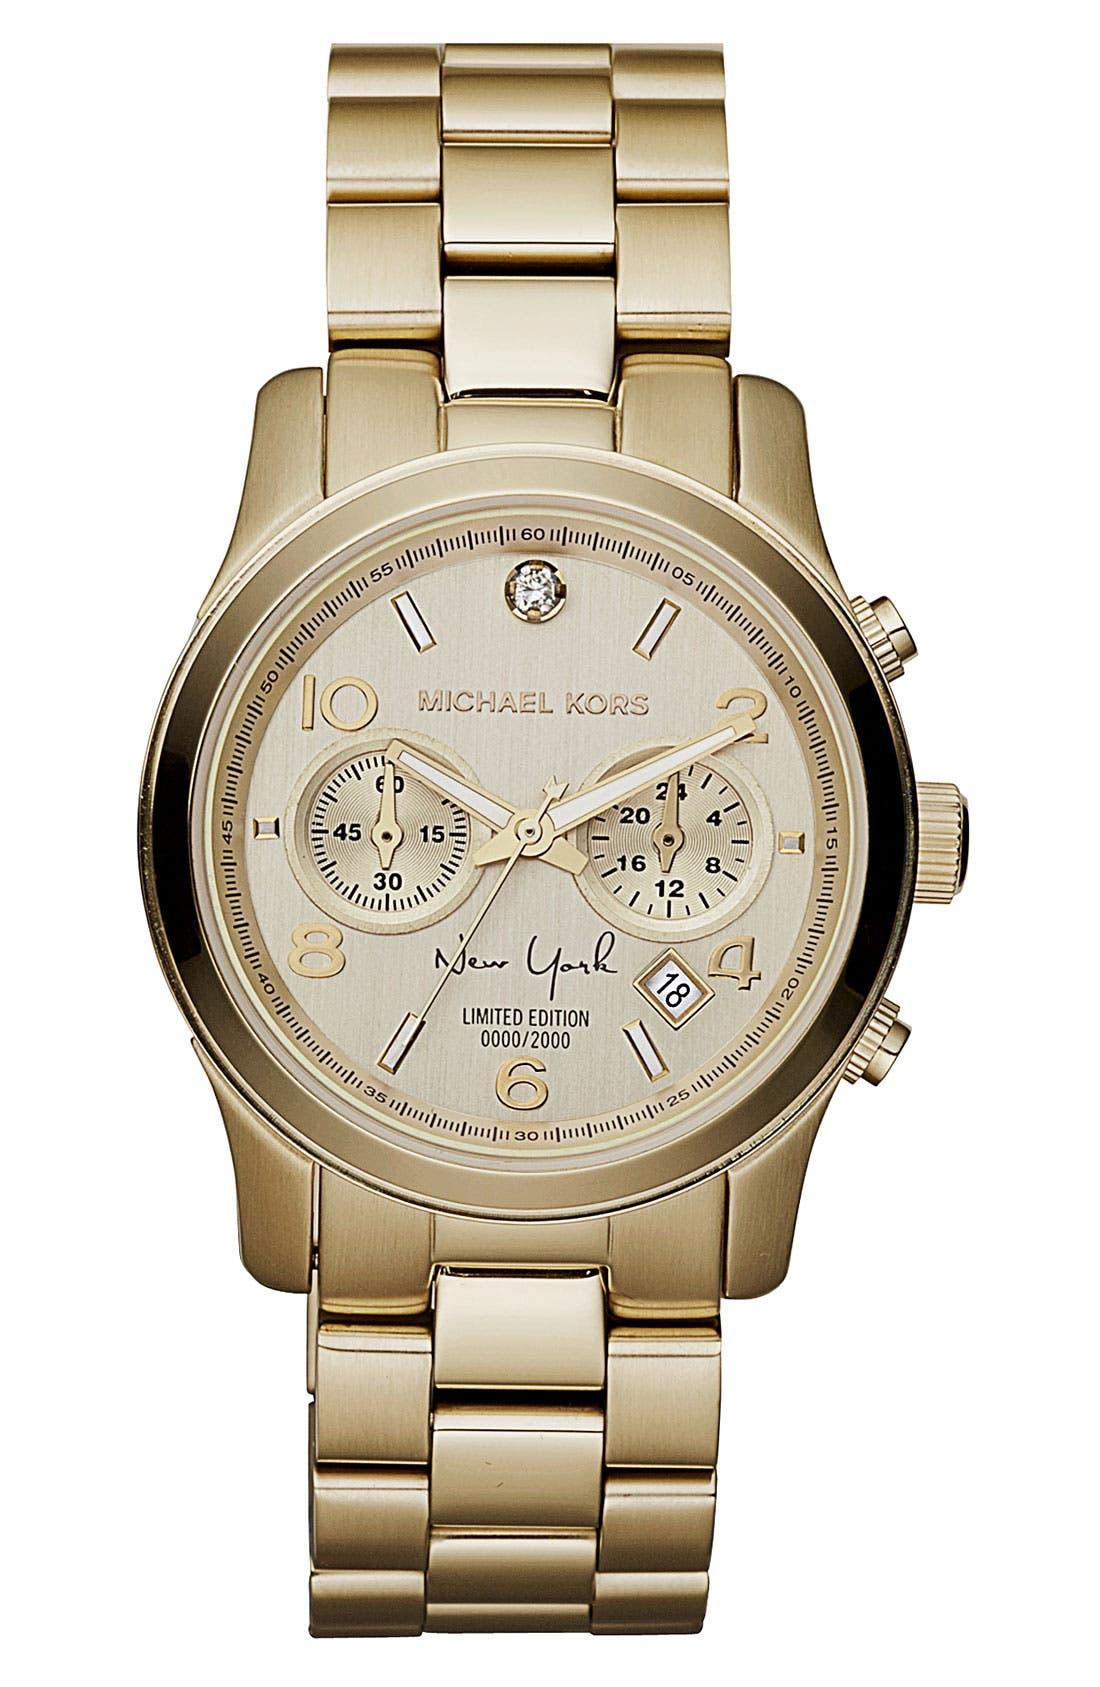 Main Image - Michael Kors 'Runway - New York' Chronograph Bracelet Watch, 38mm (Limited Edition)